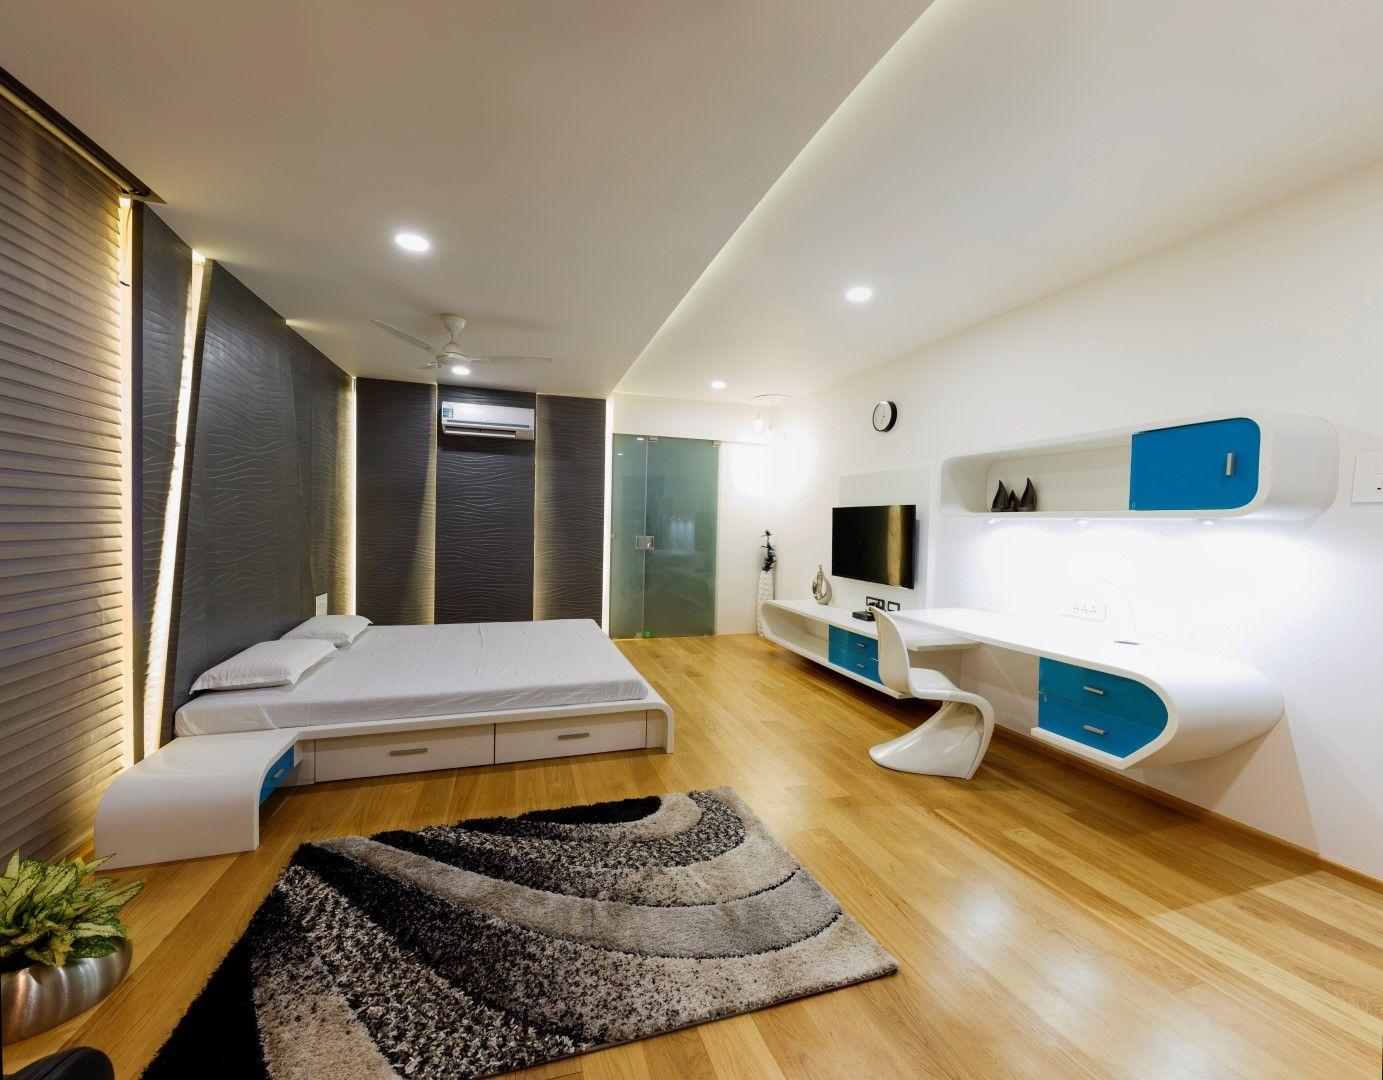 WOVEN HOUSE Sunil Patil u0026 Associates